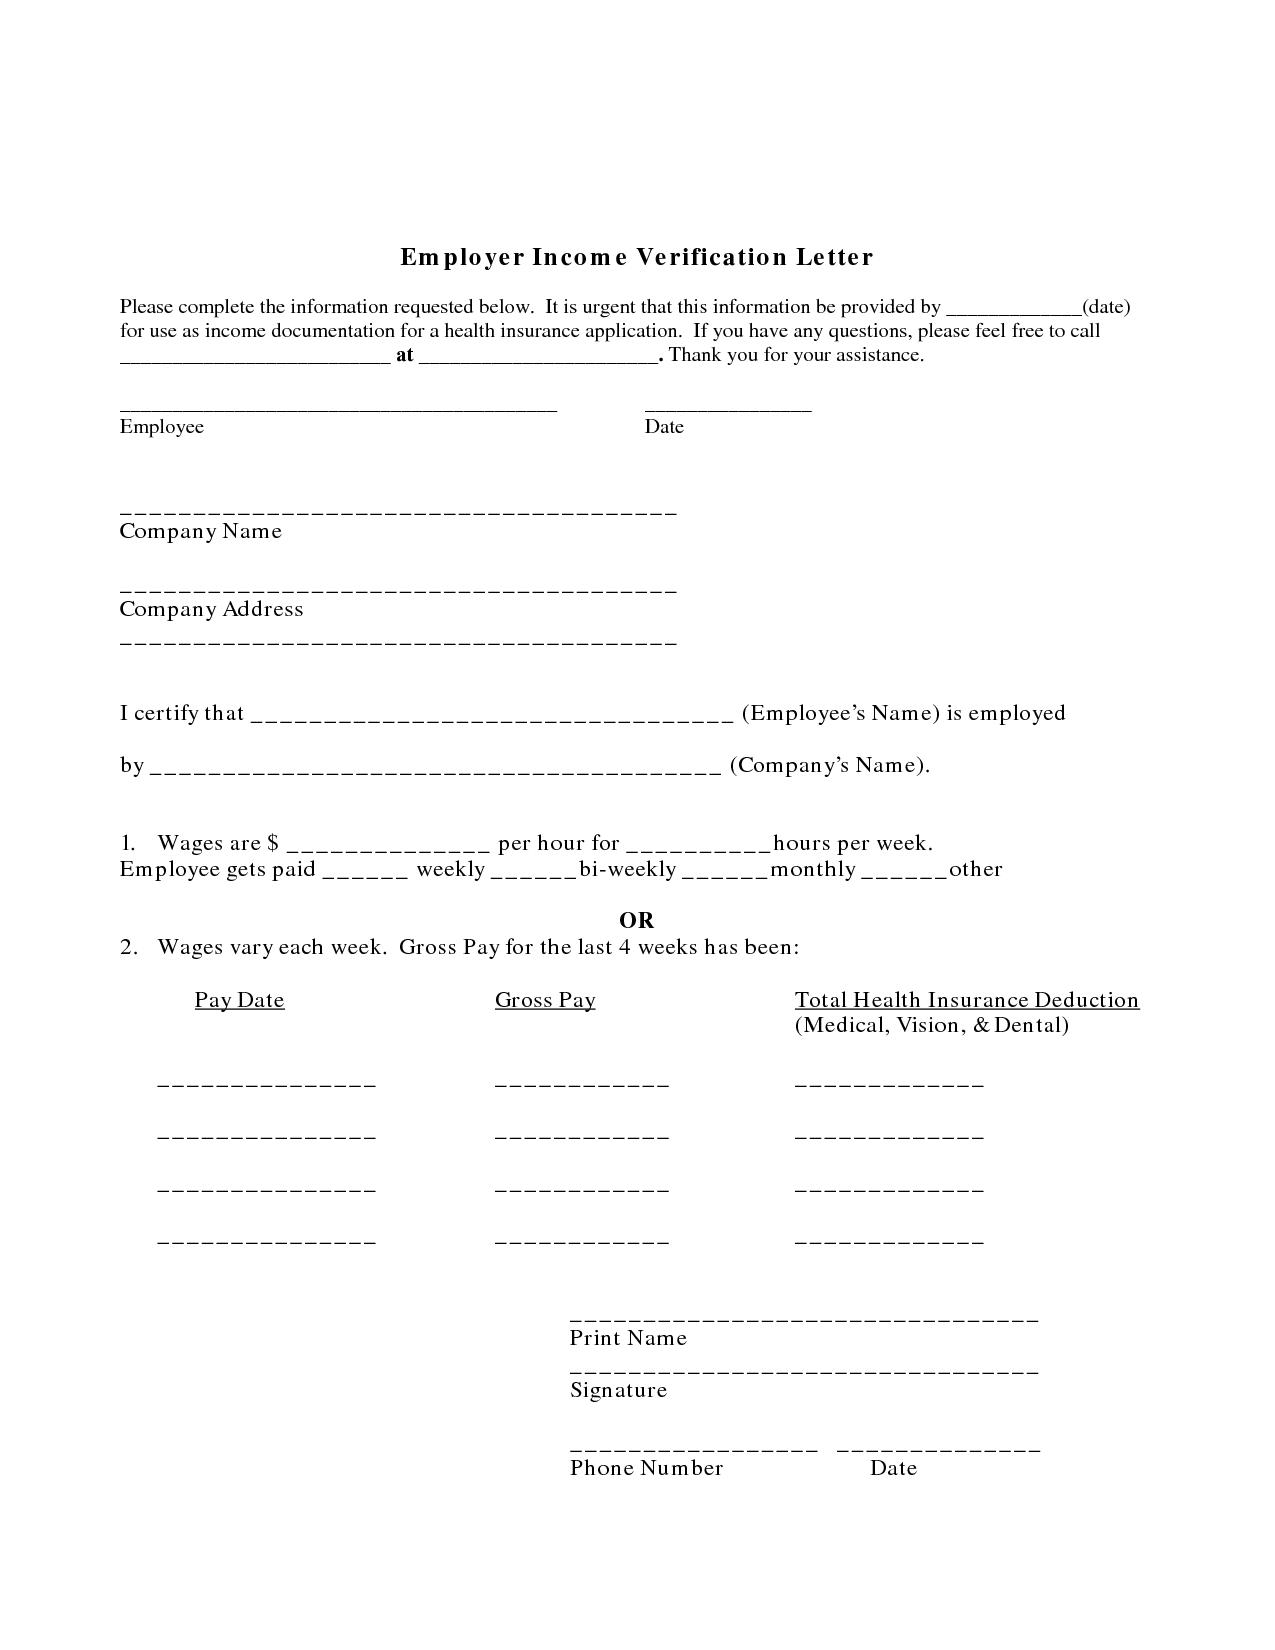 Example Employment Verification Letter Income | Printables | House - Free Printable Employment Verification Letter